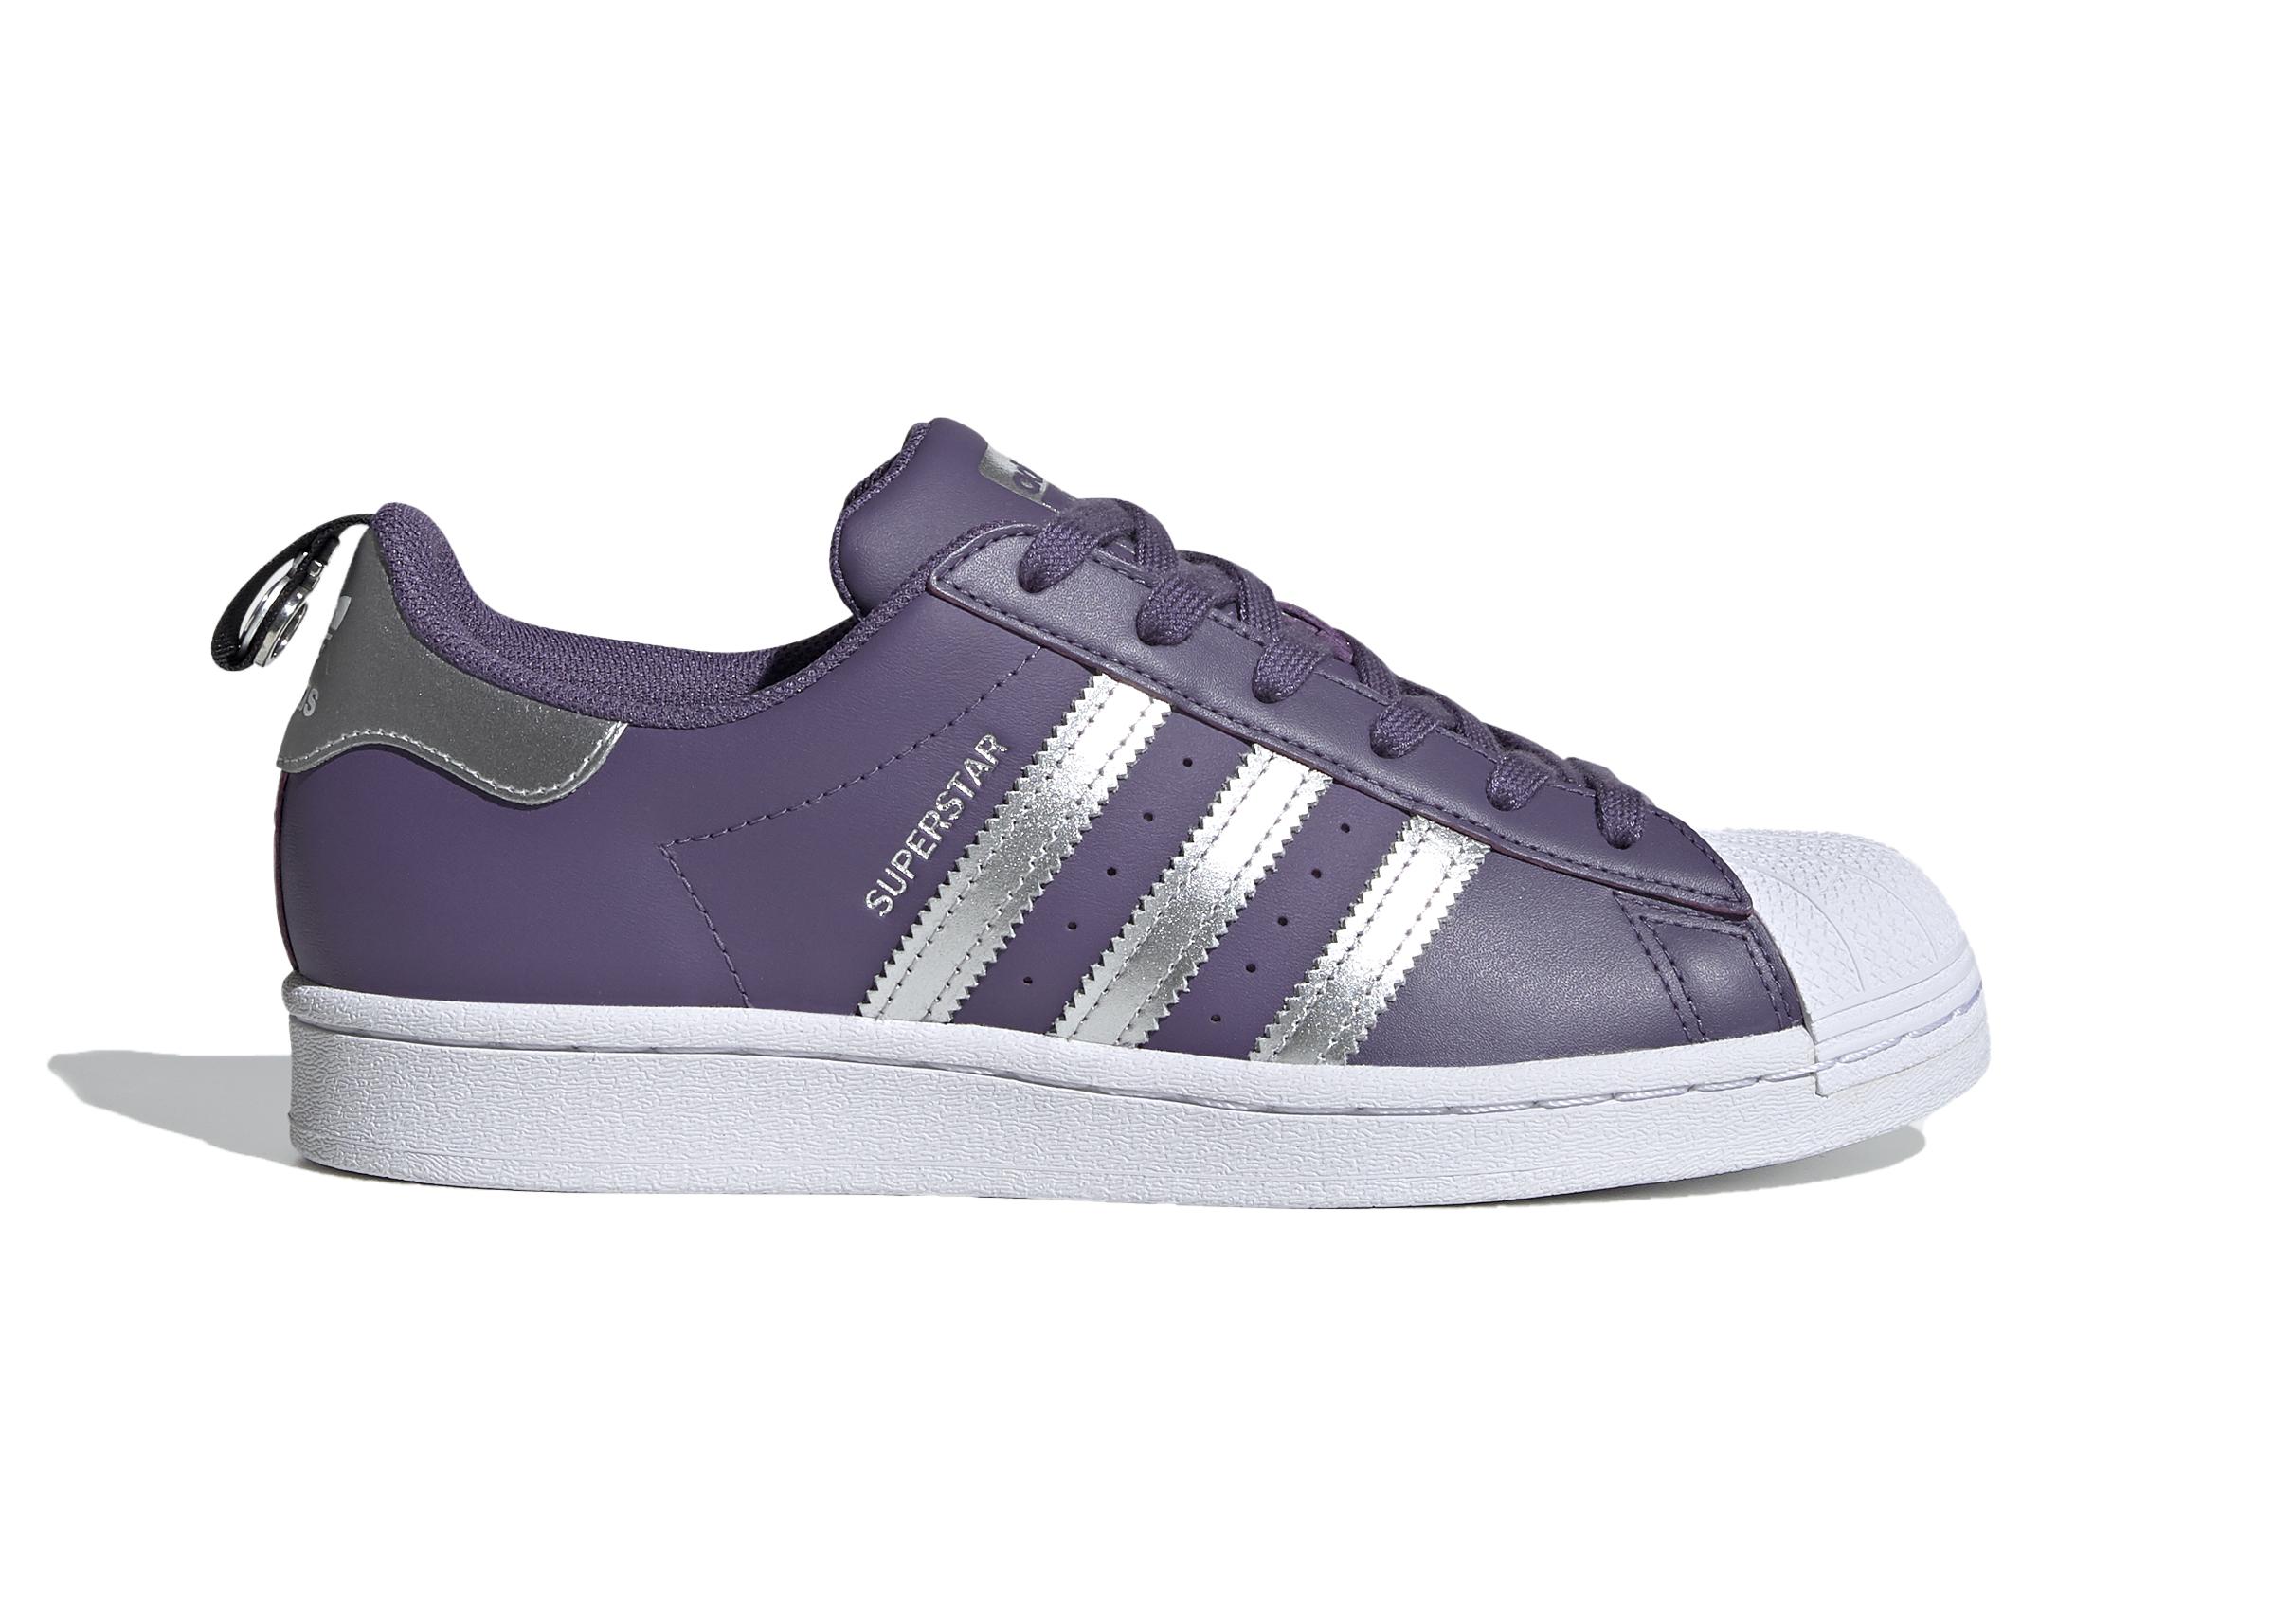 adidas Superstar Tech Purple (W)